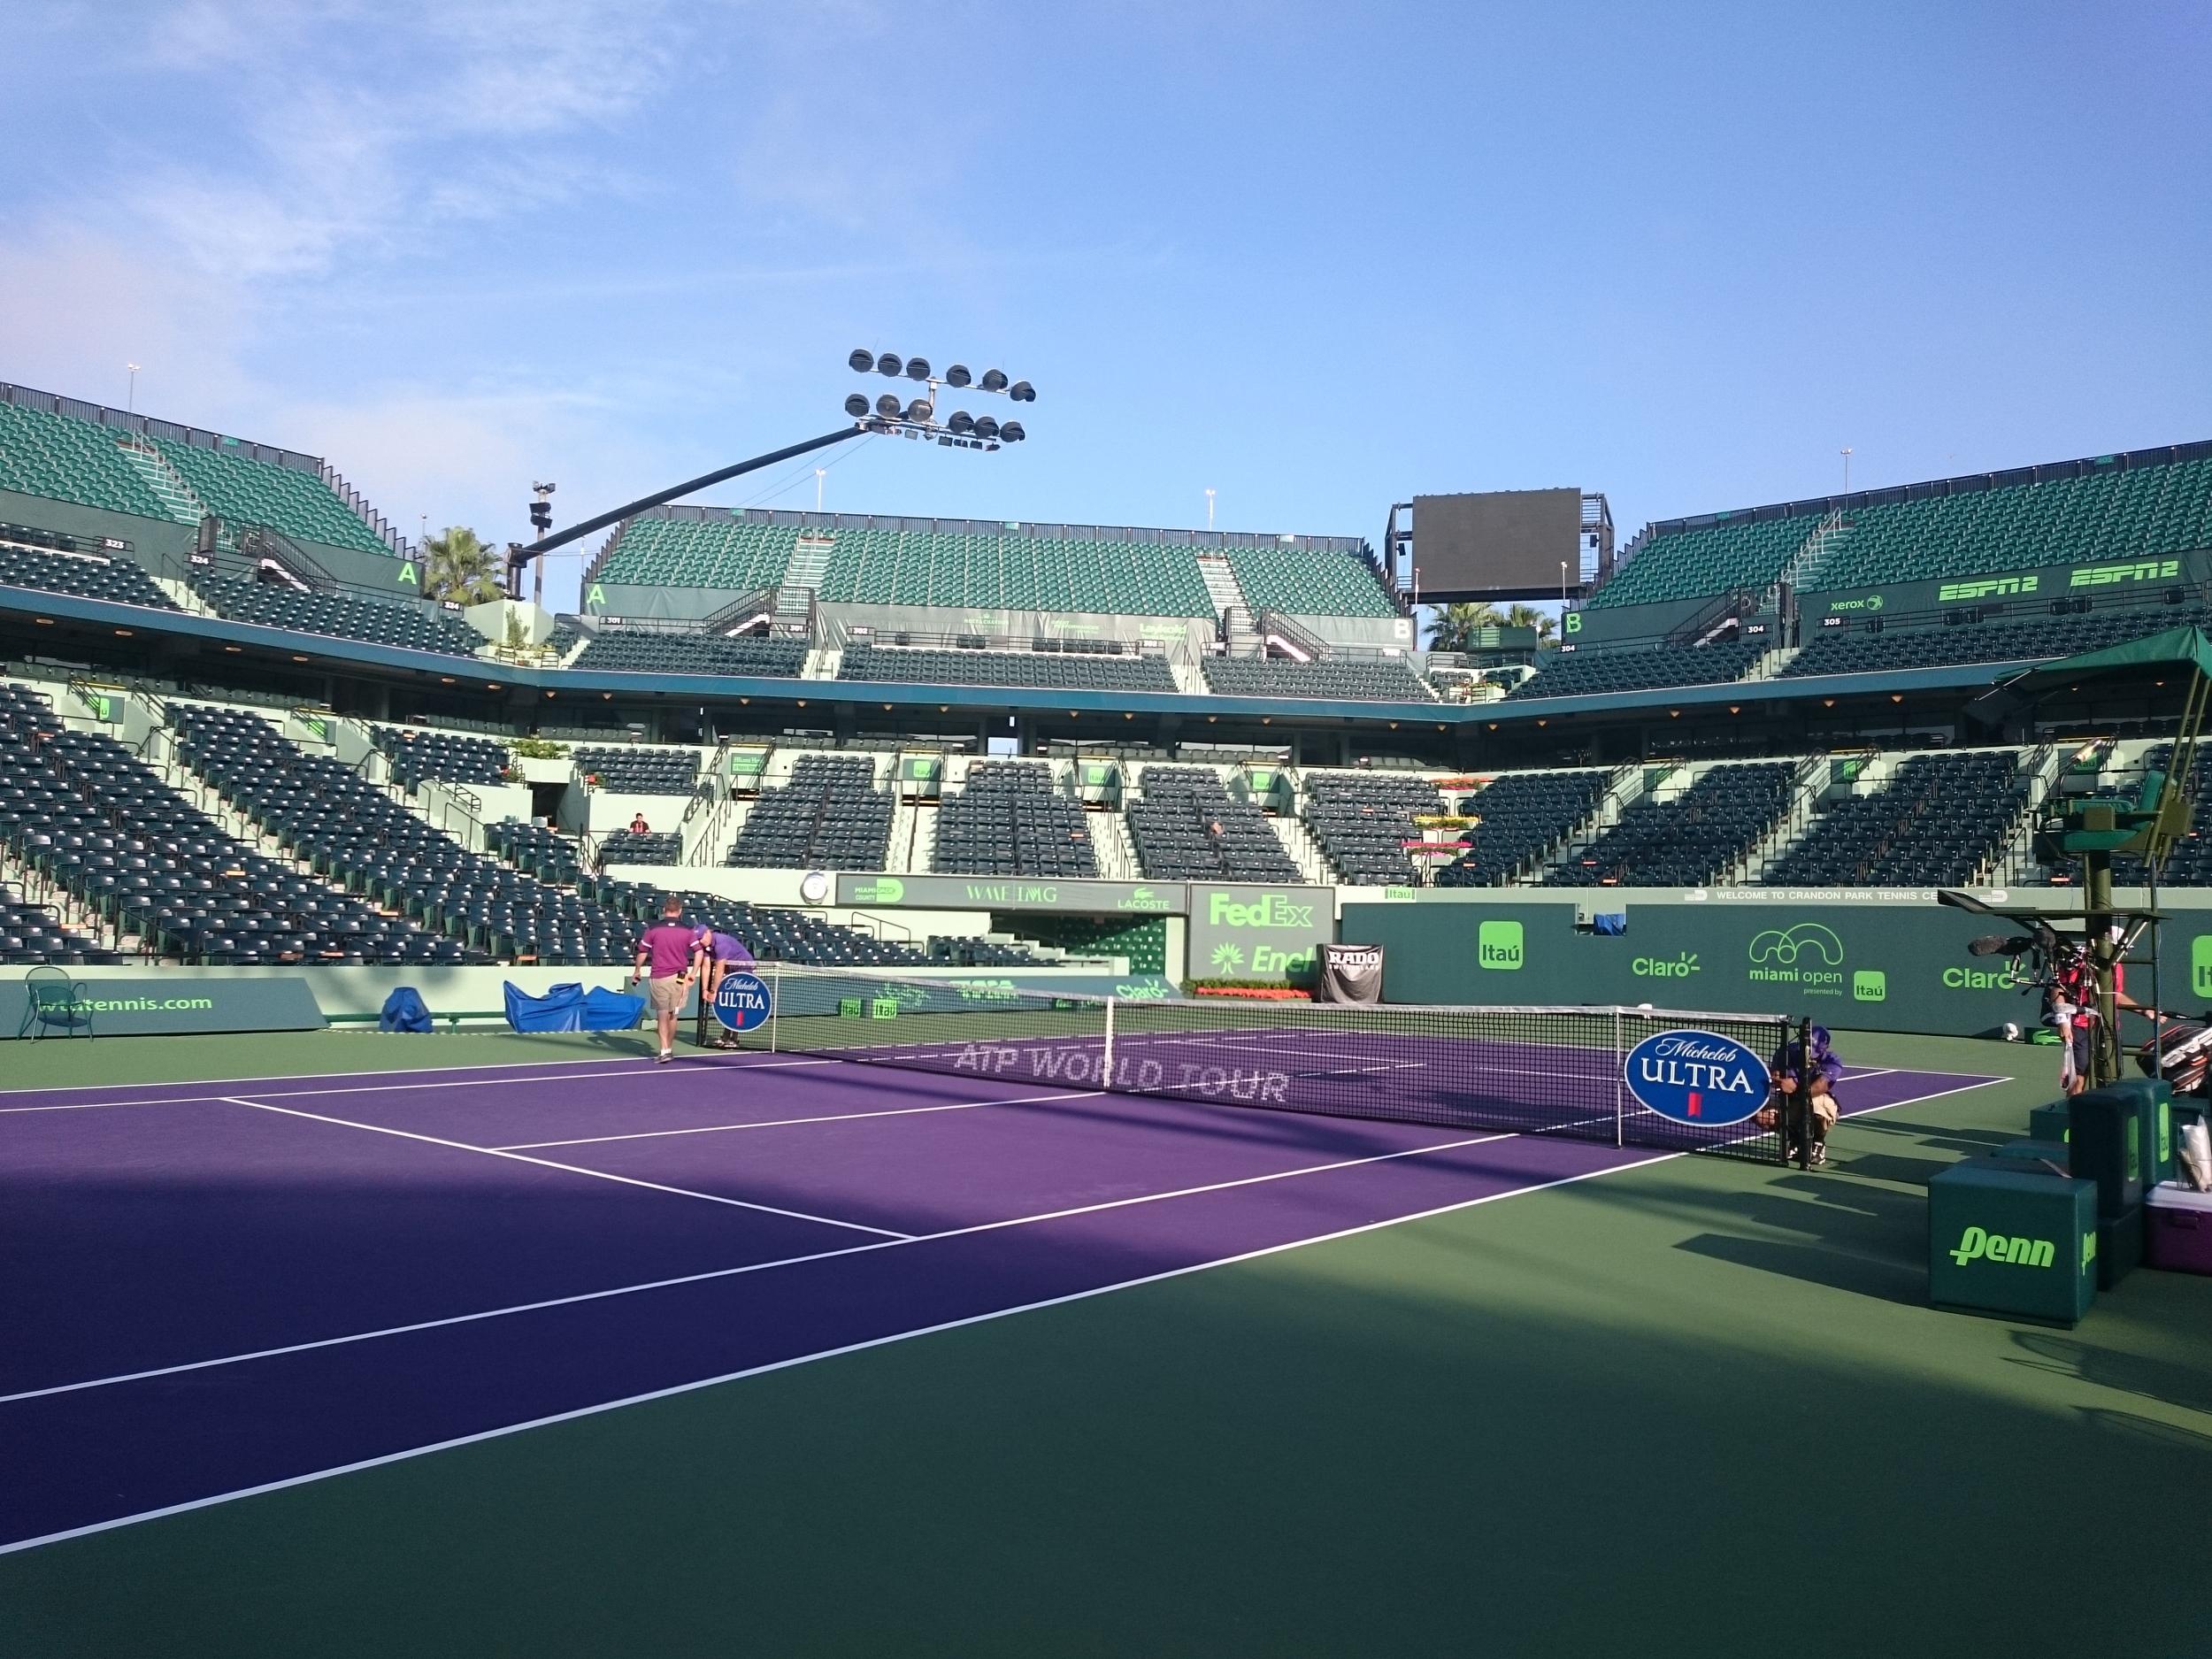 Miami Open 2015